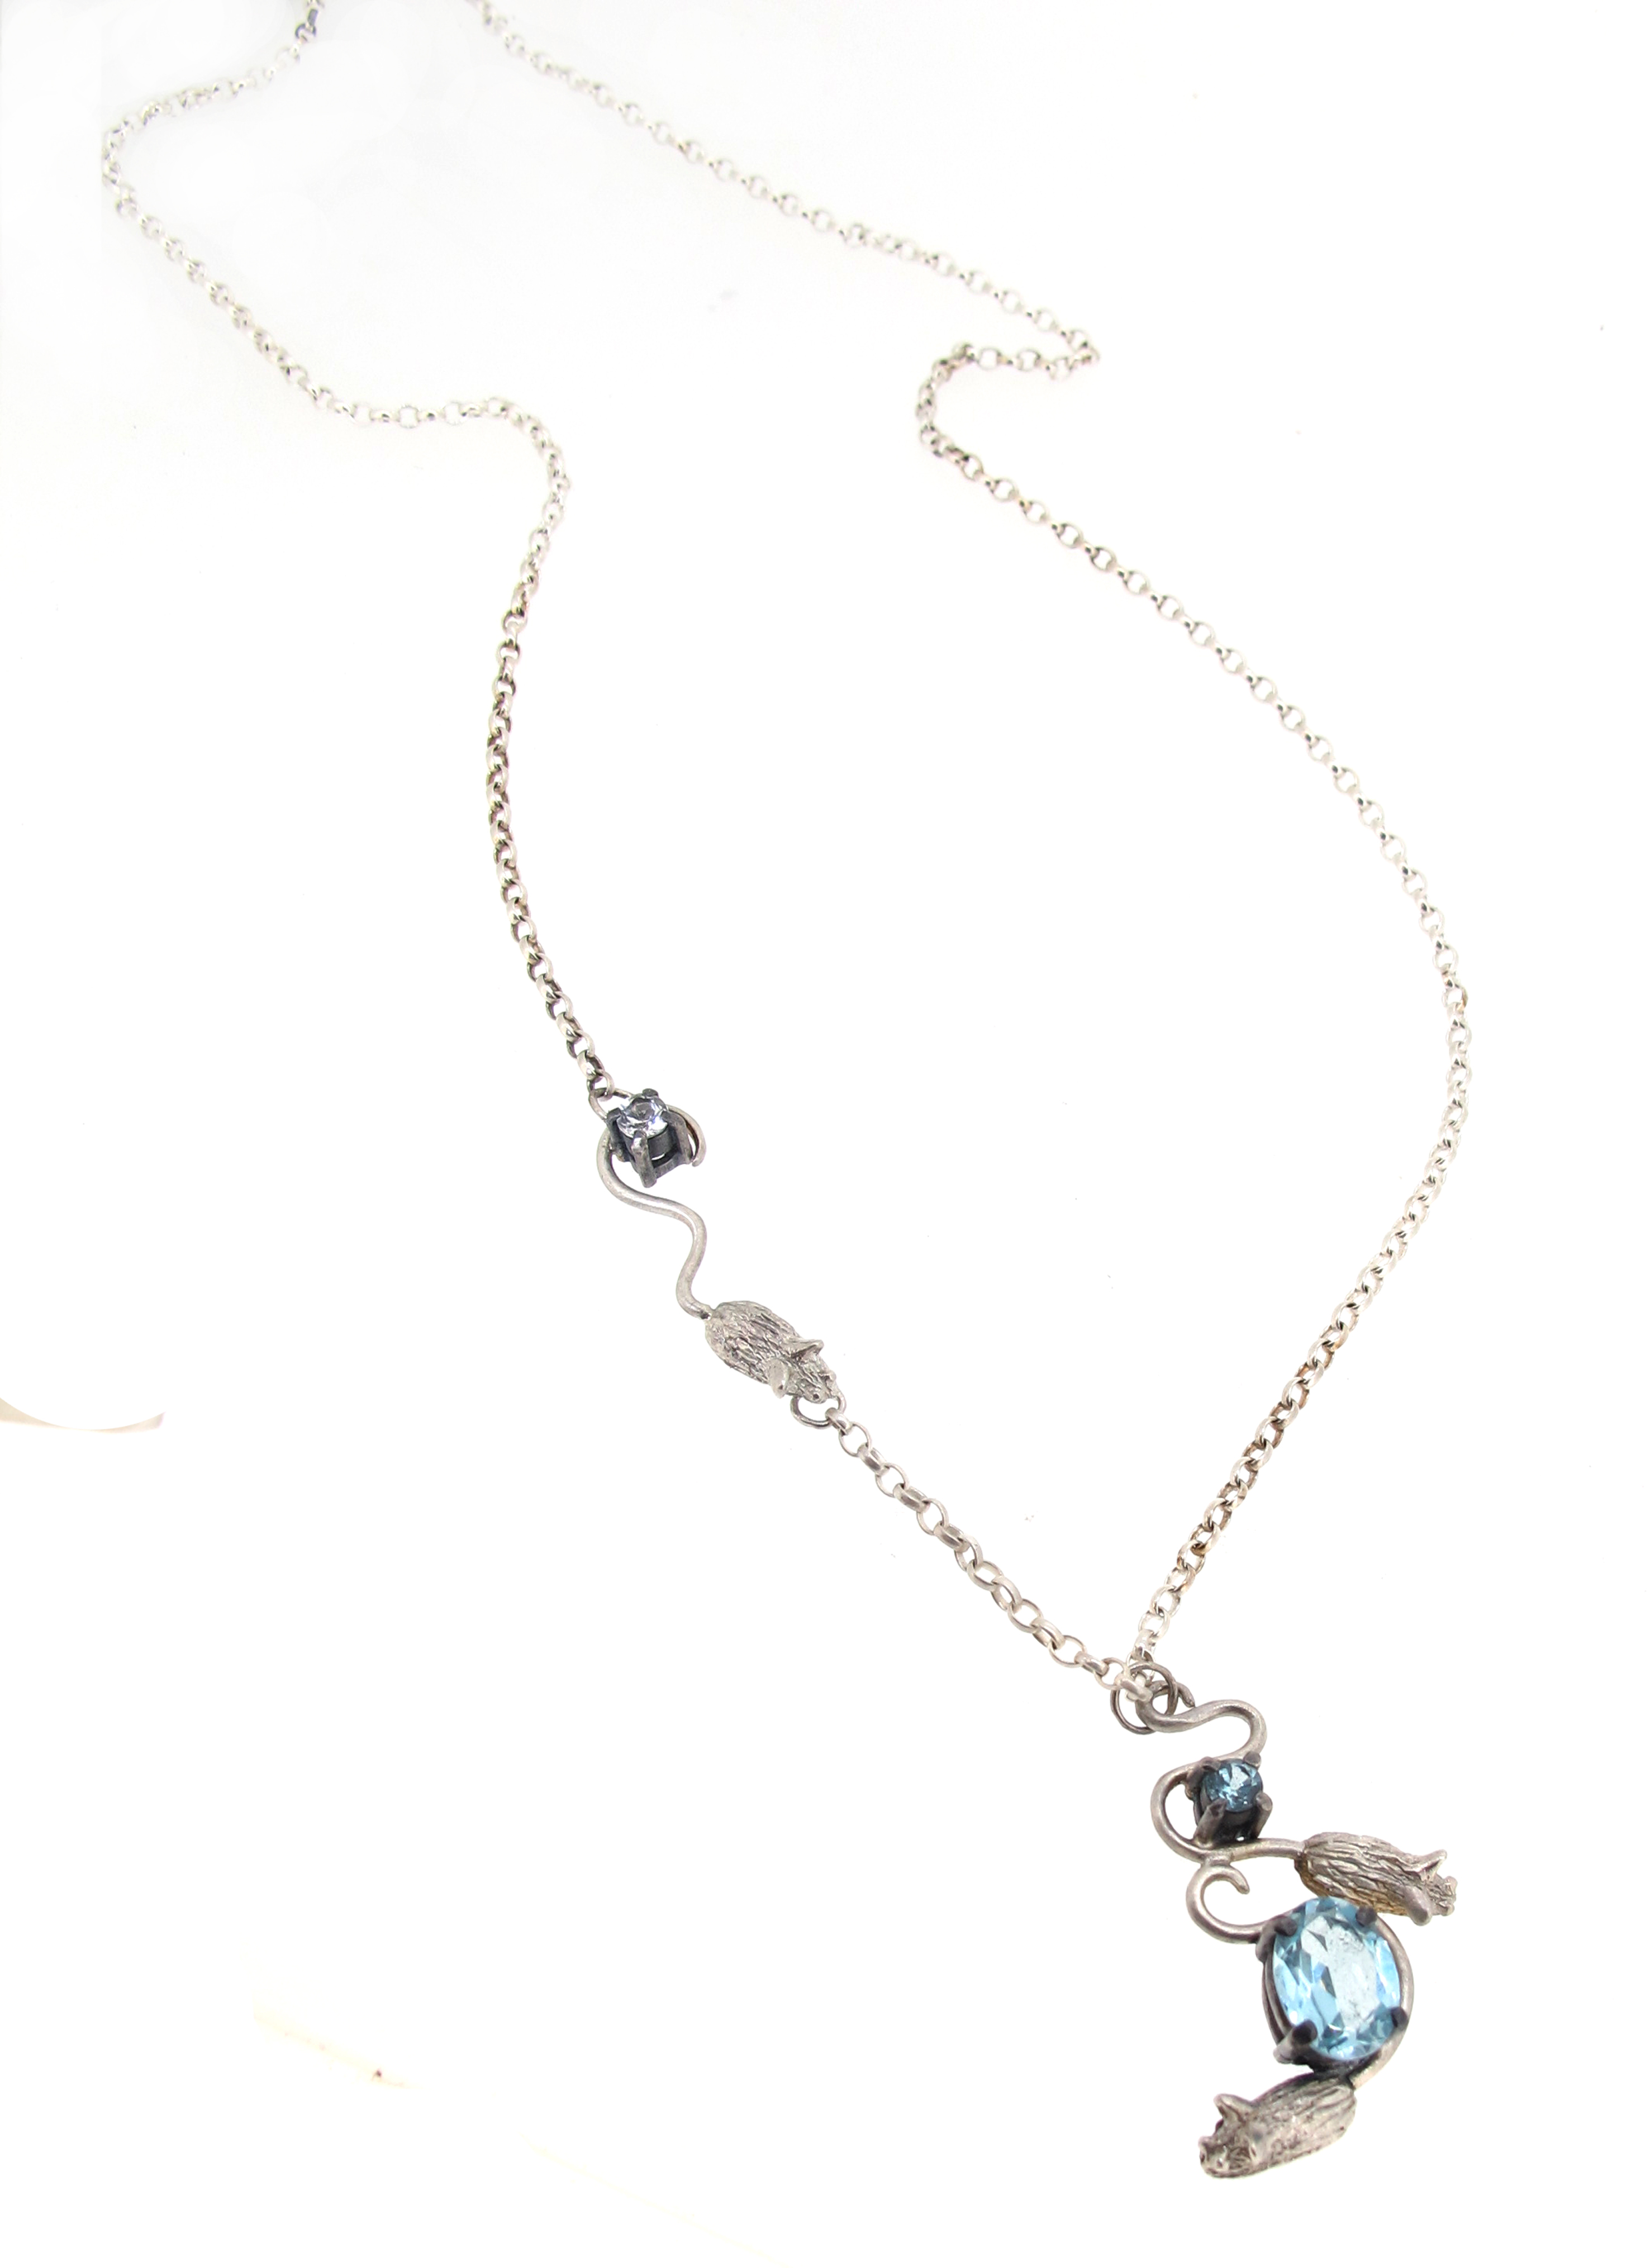 Topaz mouse necklace